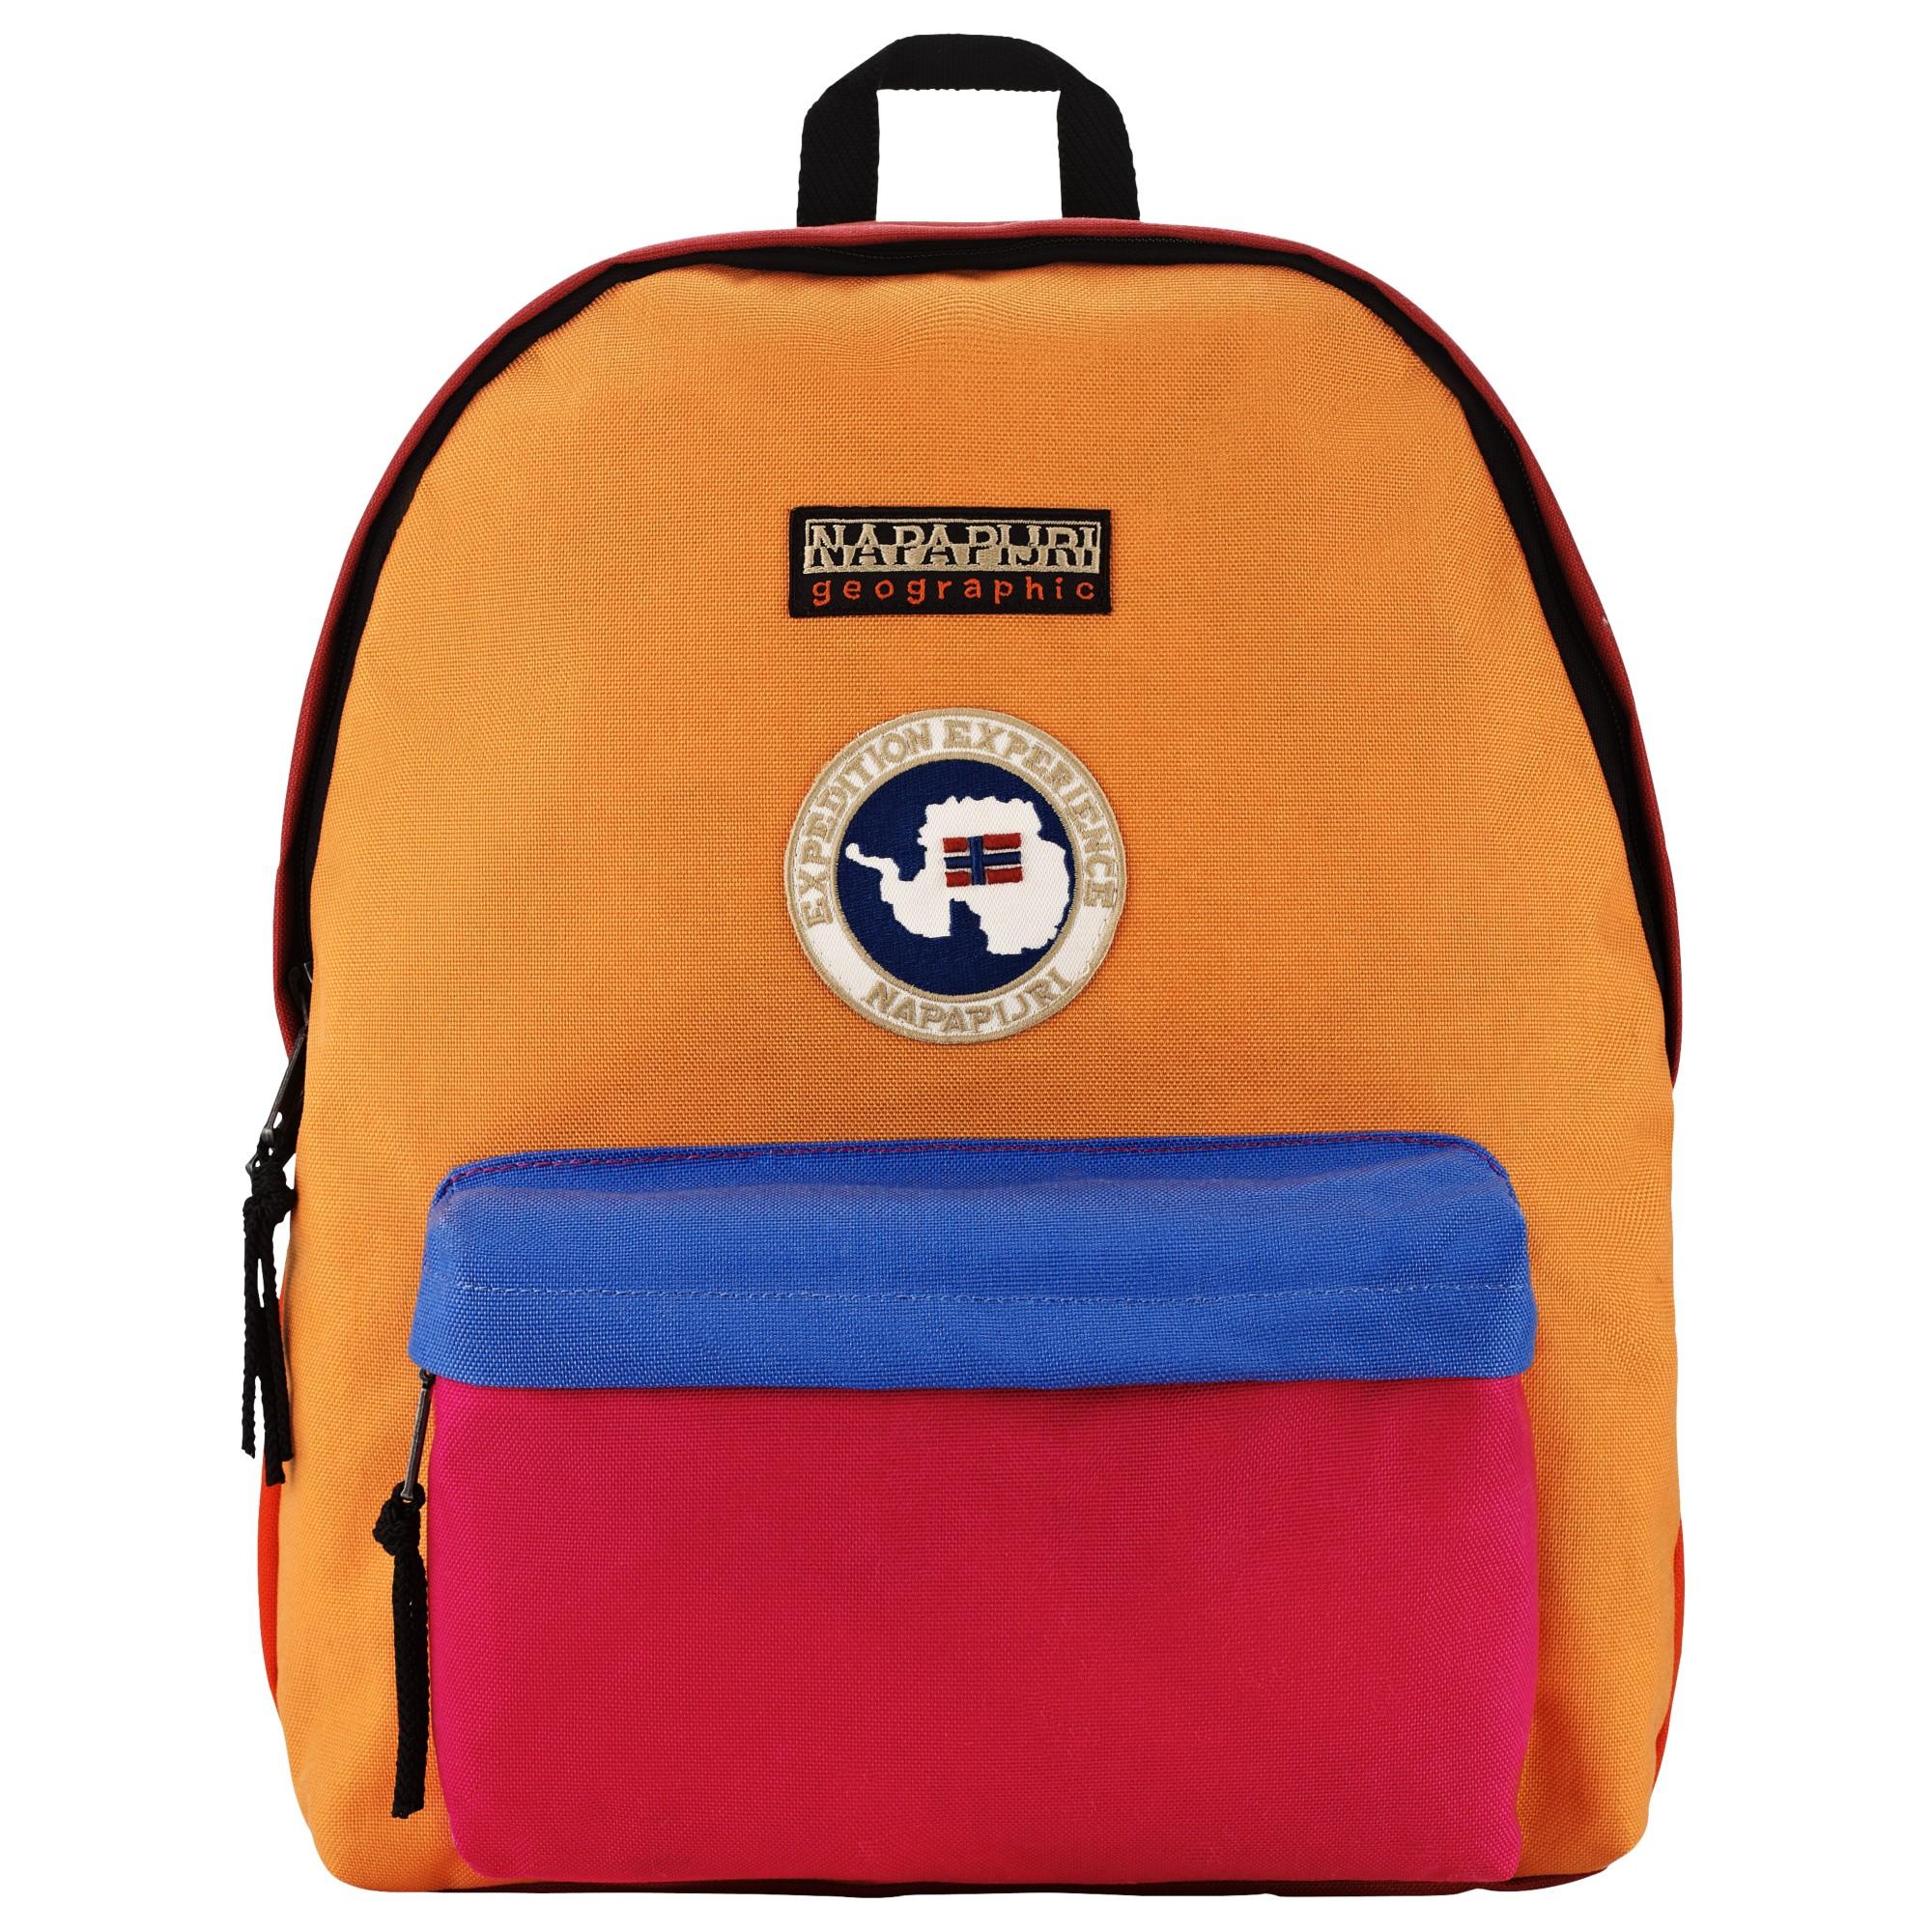 20b54d0a64af Napapijri Voyage Colour Block Backpack for Men - Lyst